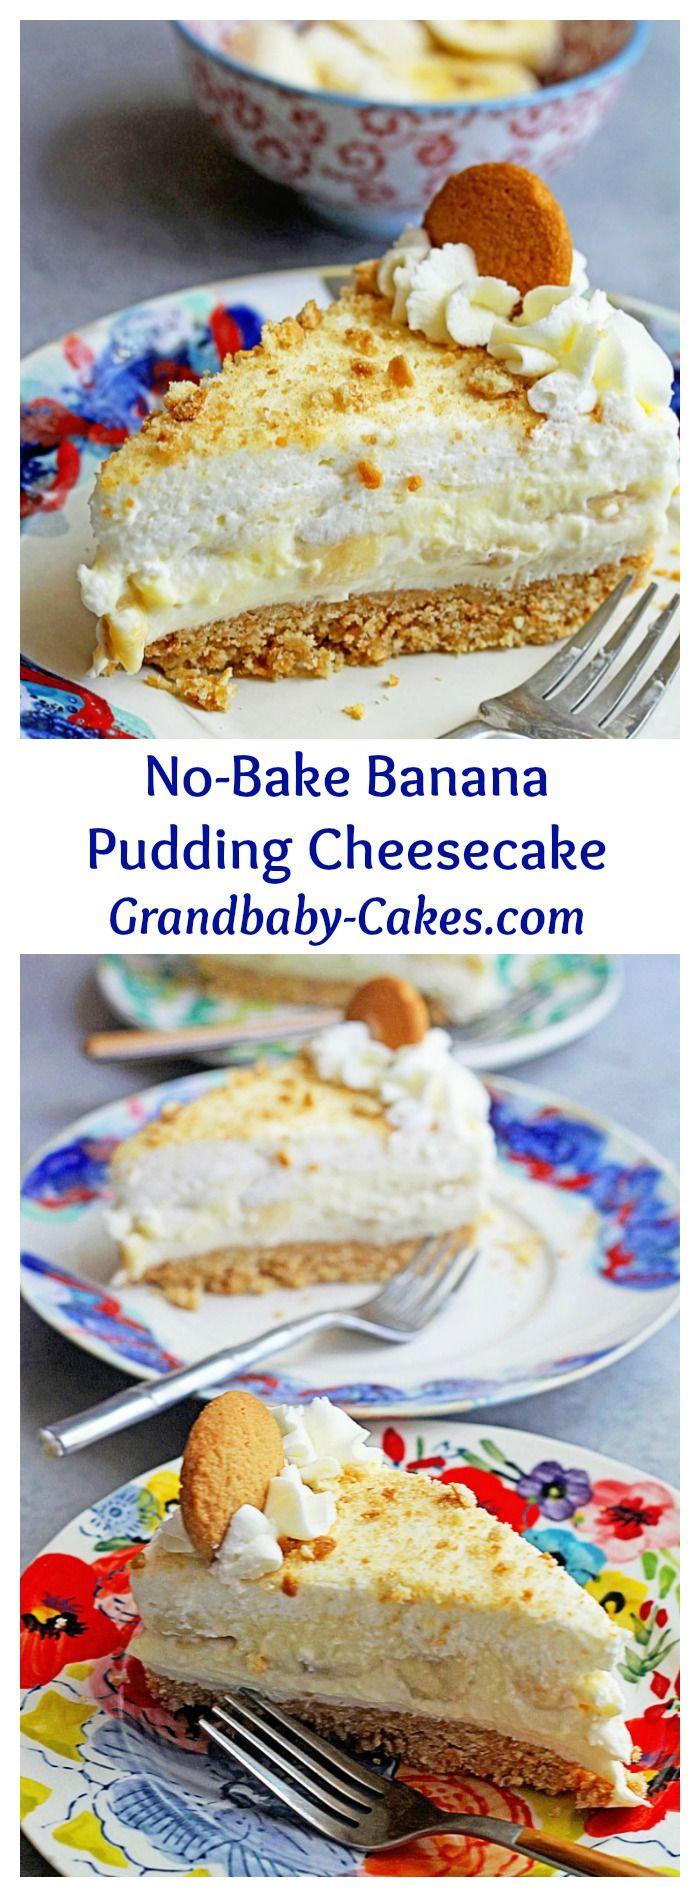 No-Bake Banana Pudding Cheesecake with Banana Cream | Grandbaby-Cakes.com